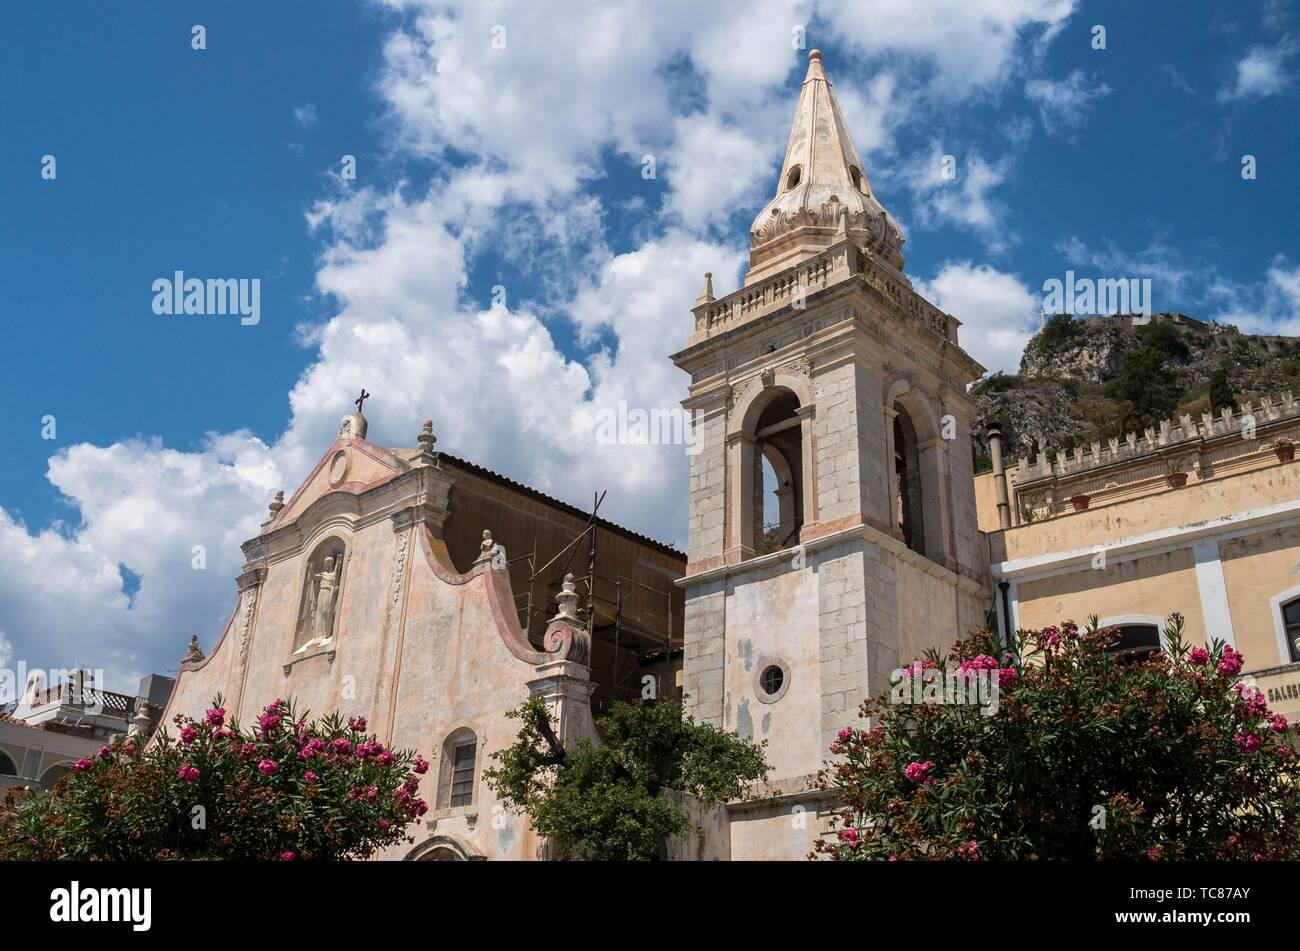 San Giuseppe church, Taormina, Sicily, Italy. - Stock Image